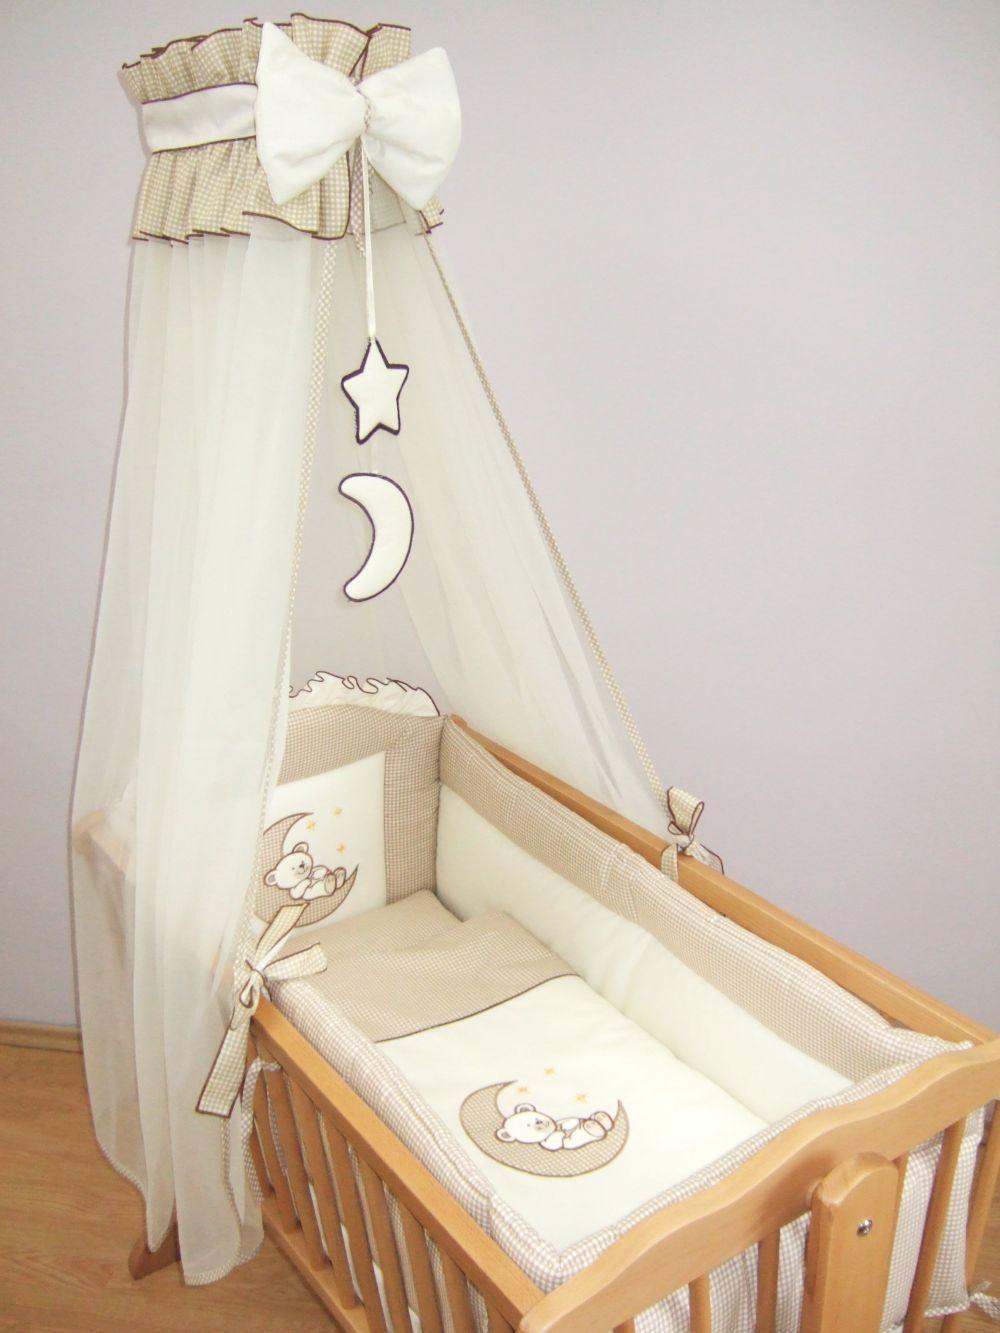 10 Piece Crib Baby Bedding Set 90x40 Cm Fits Swinging